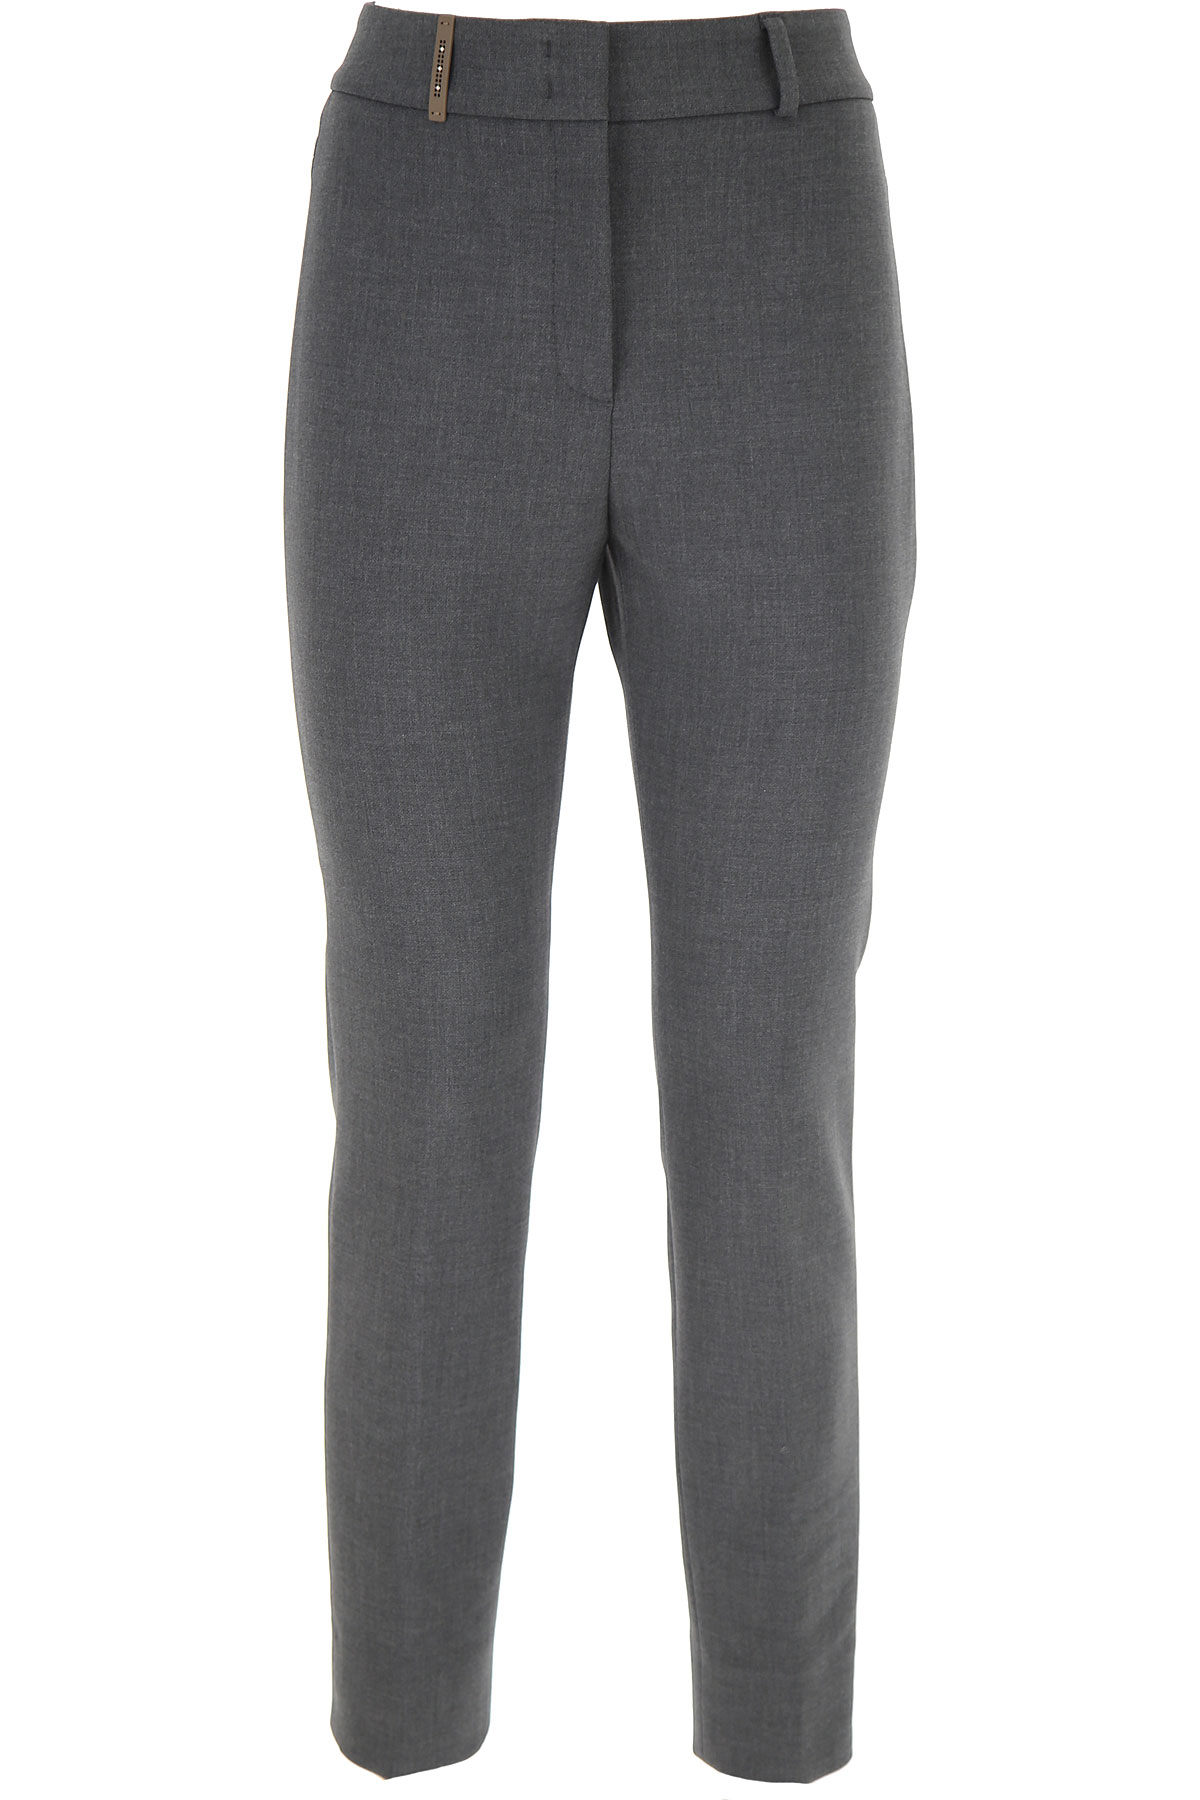 Peserico Pants for Women On Sale, Medium Grey, polyester, 2019, 26 28 30 32 34 4